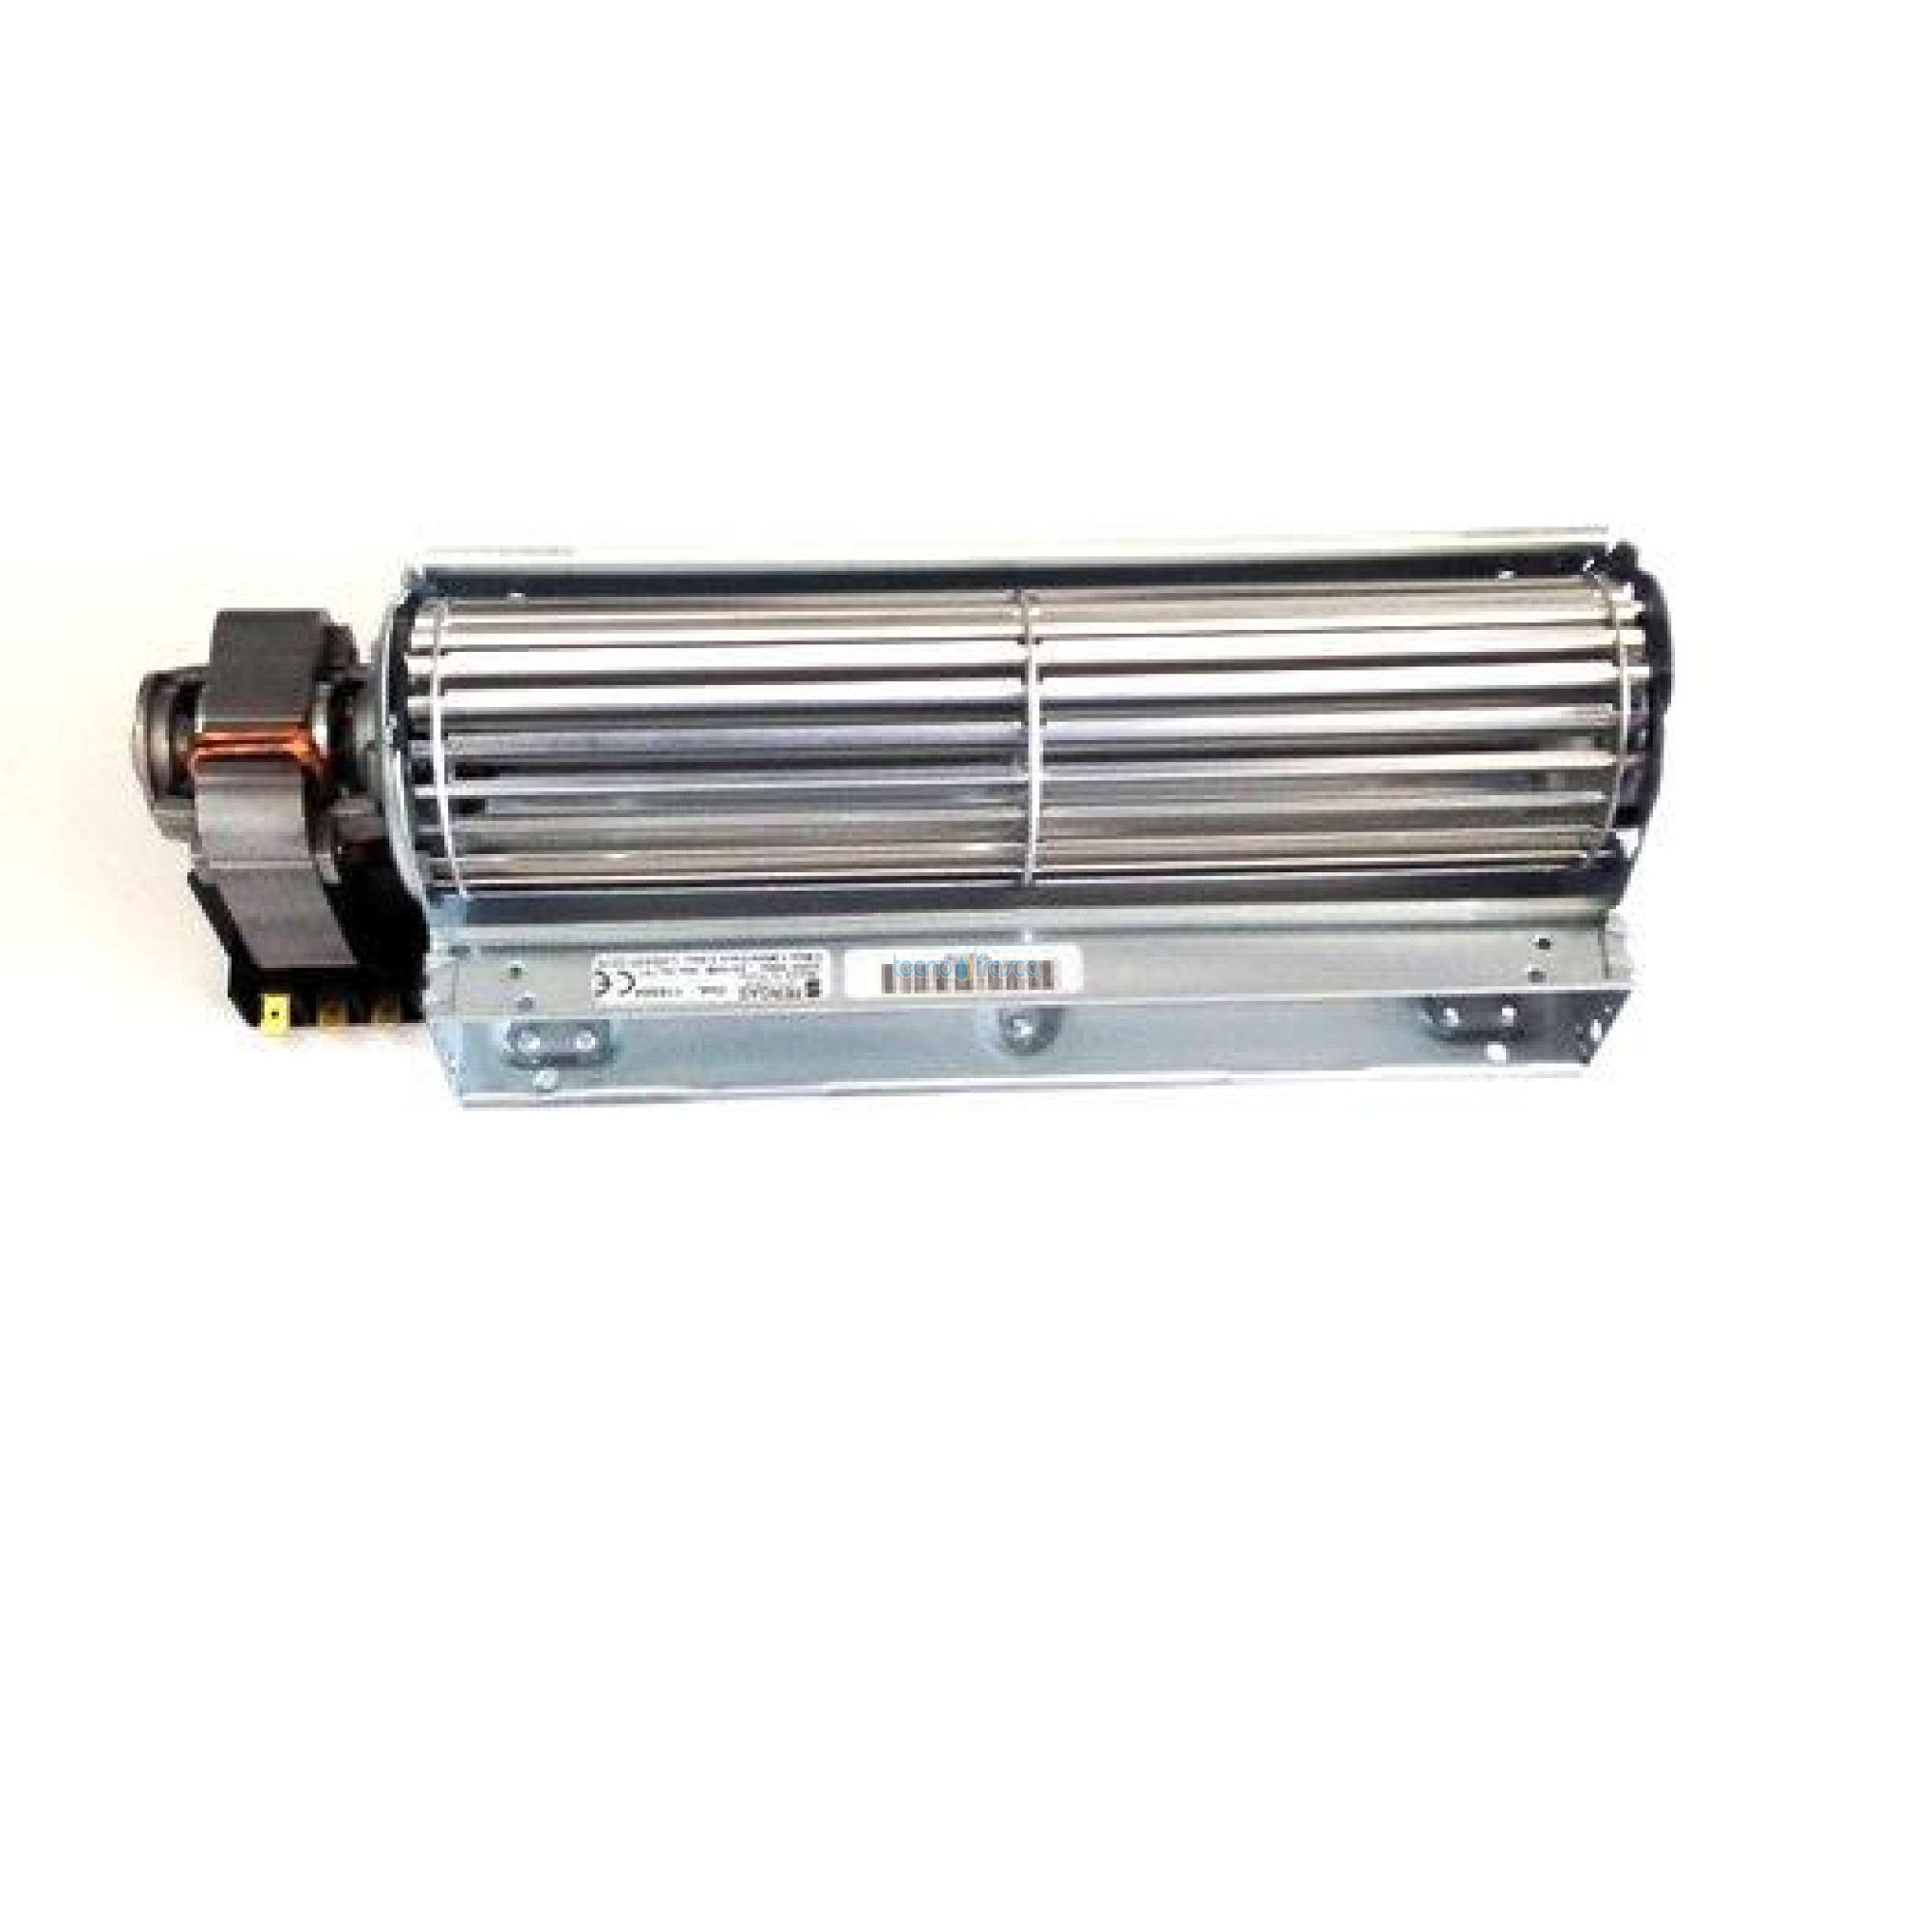 Fondital ventilatore tg480 2 velocita 3000 6yventan01